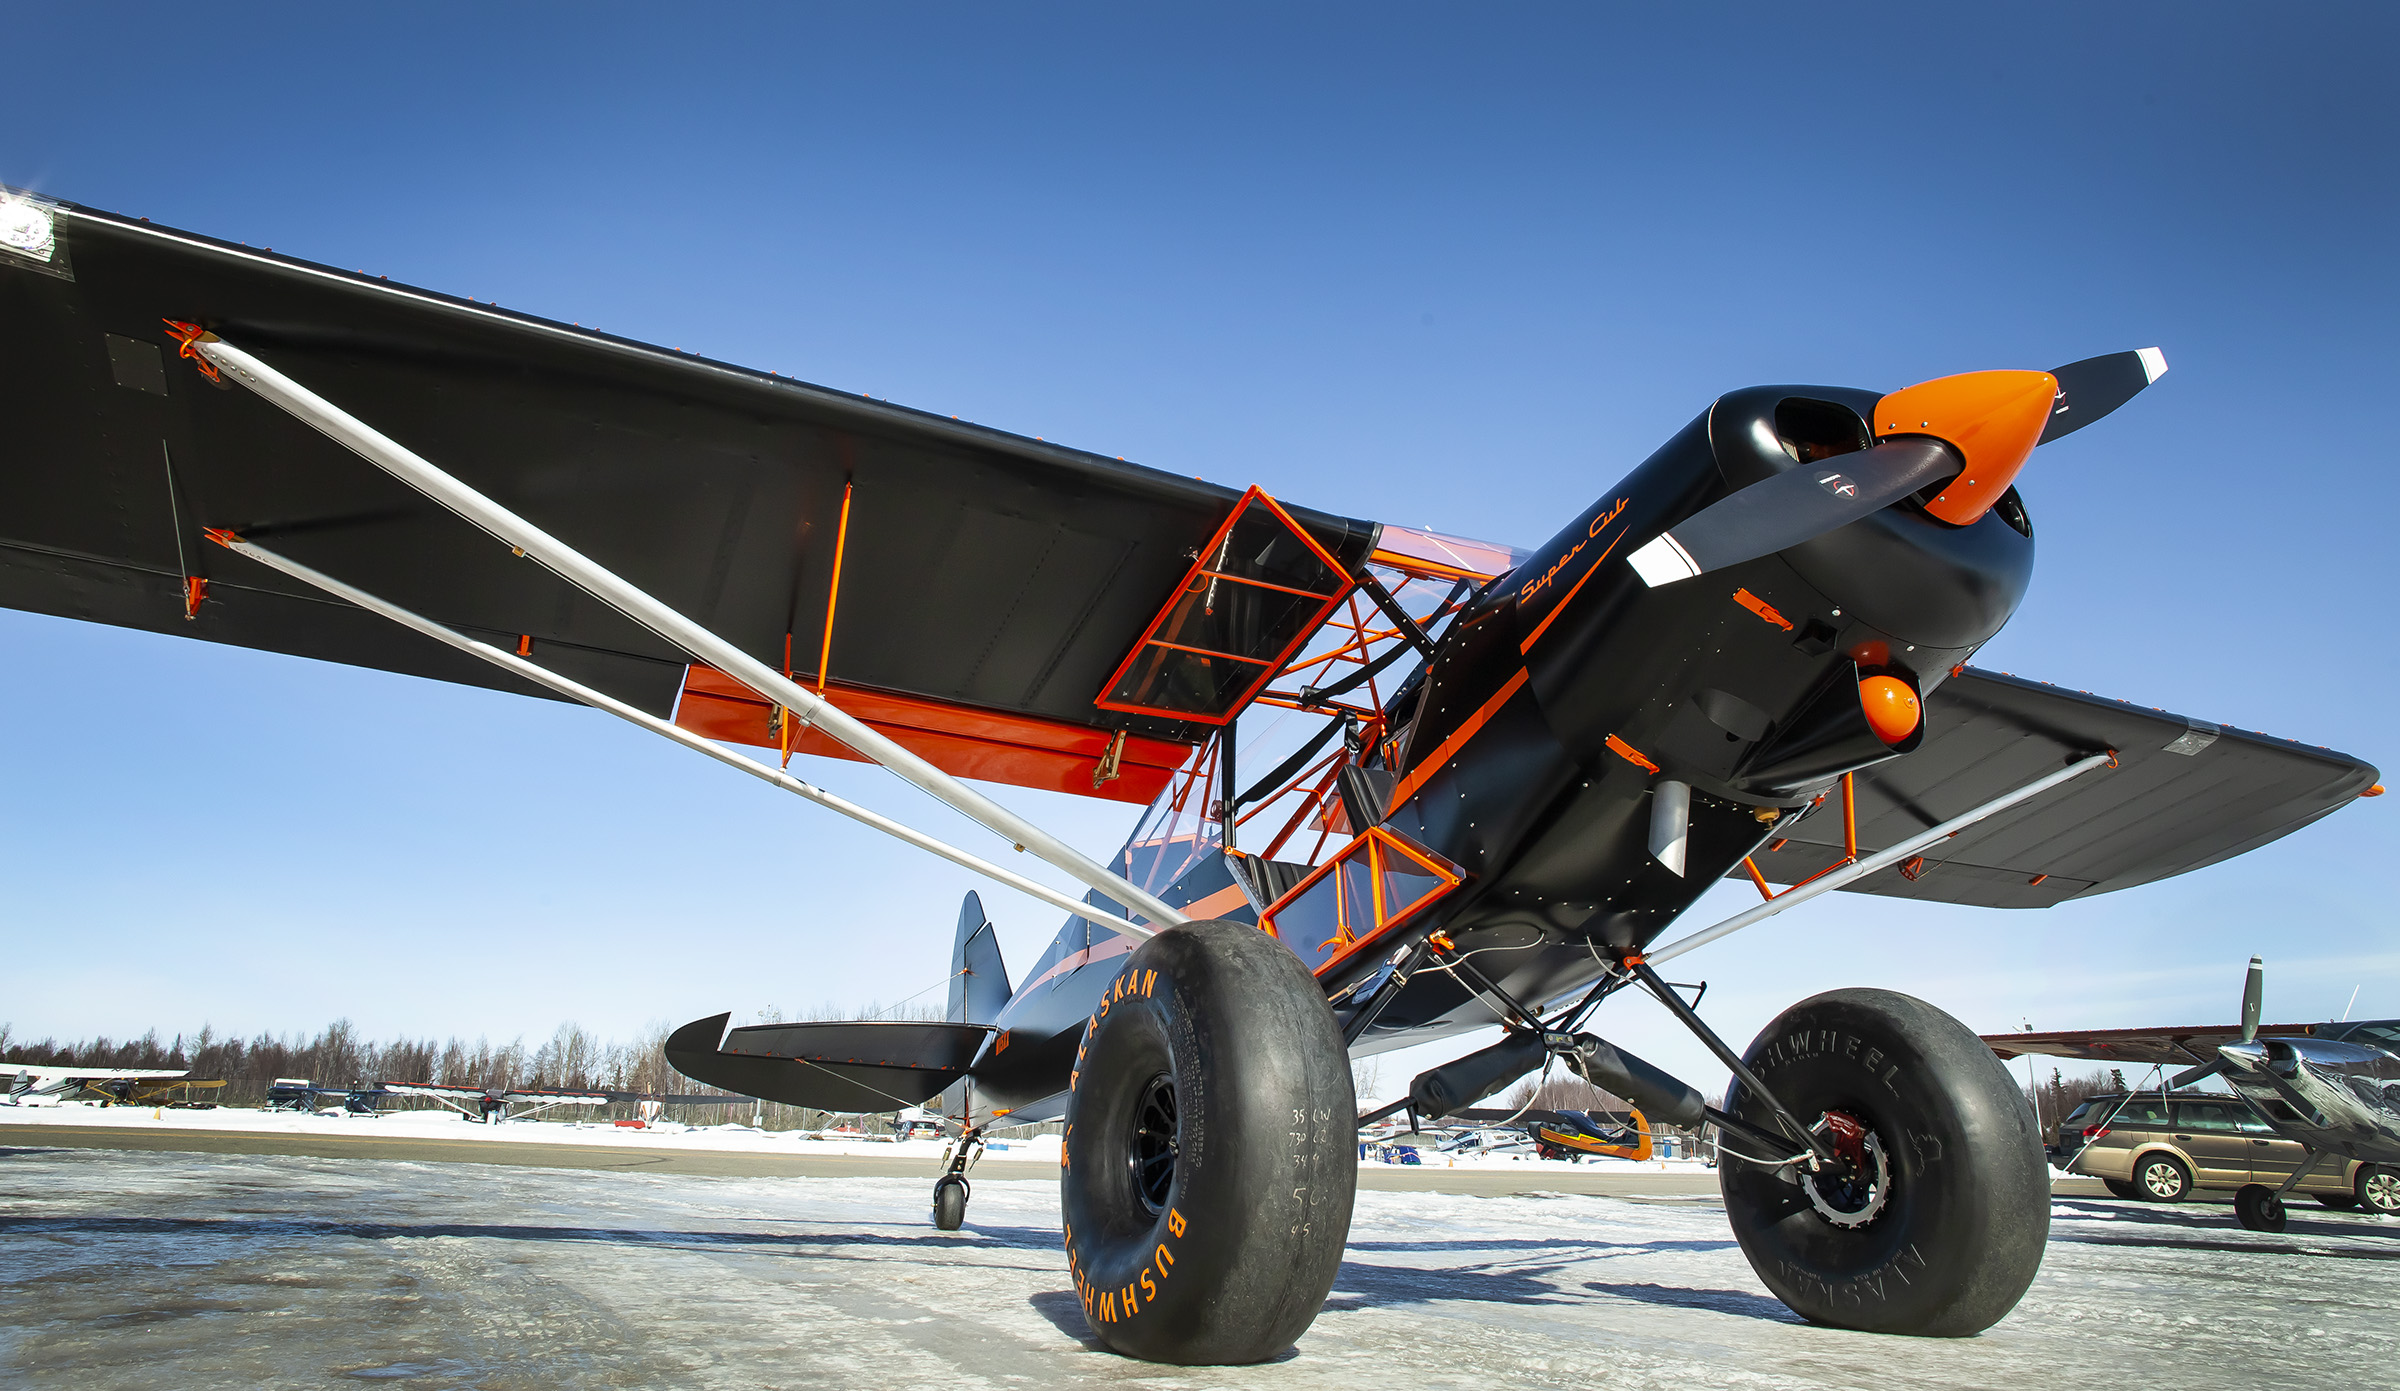 Super Cub with Alaskan Bushwheels low angle image